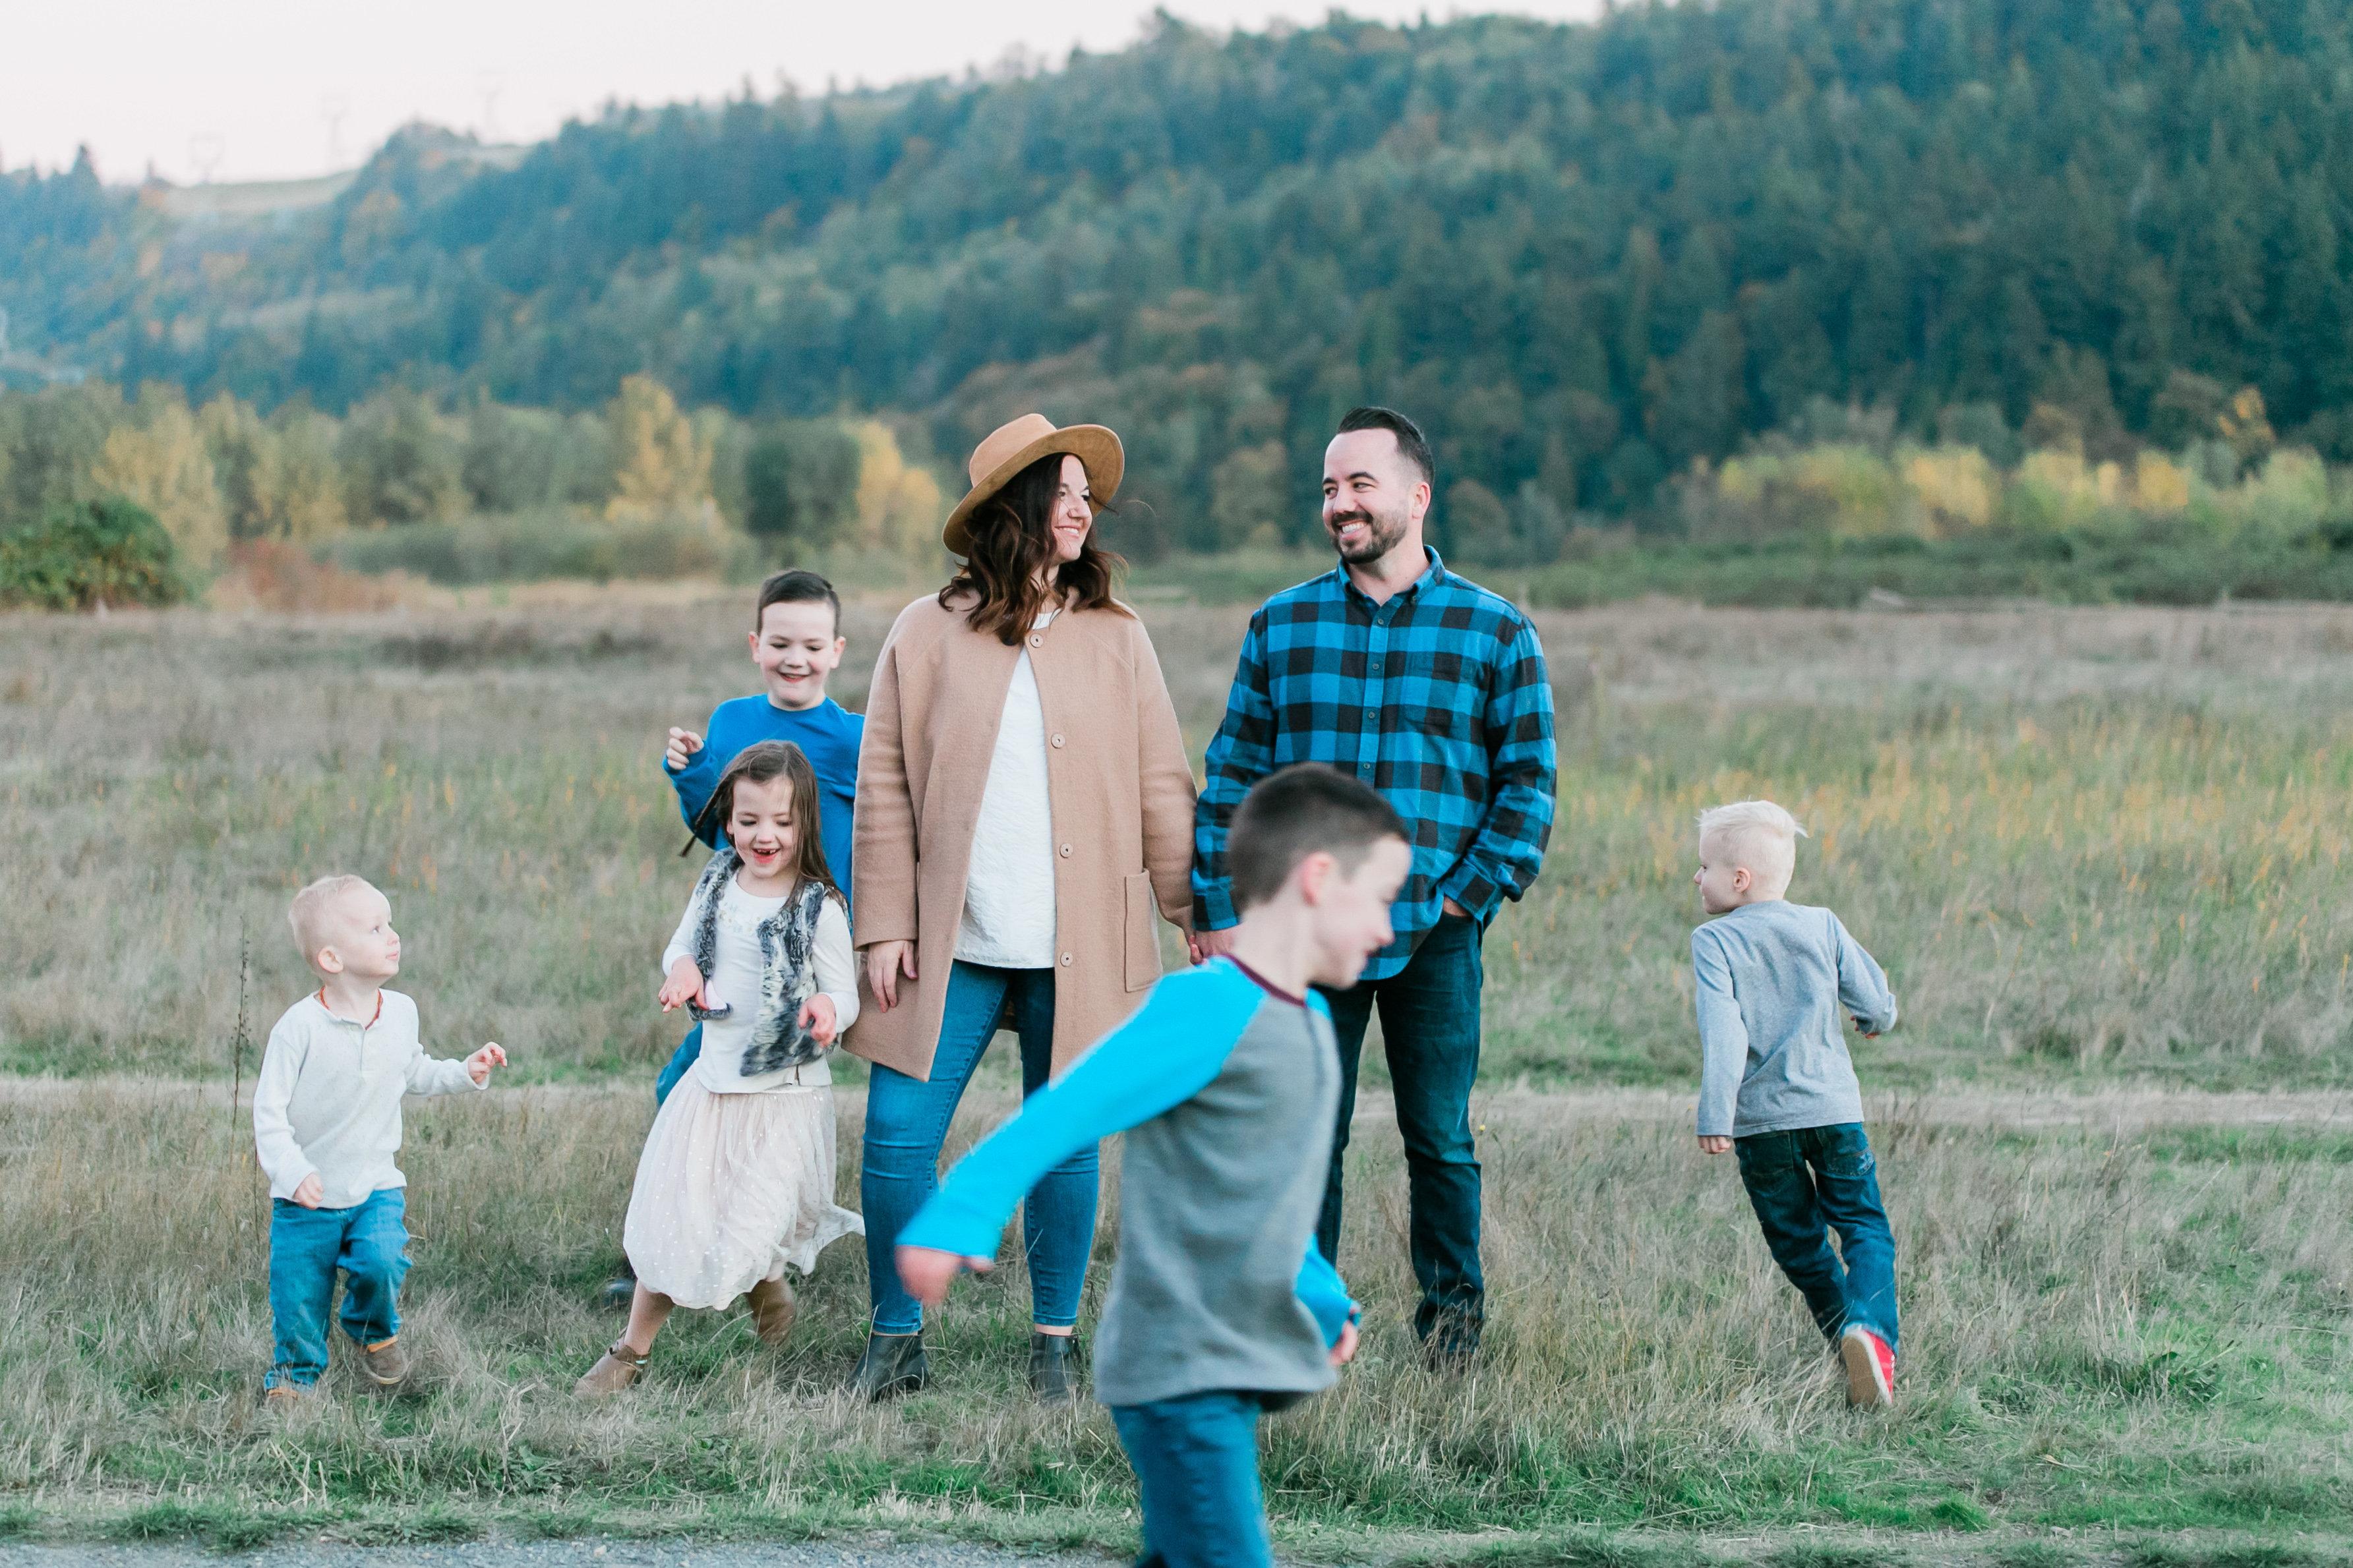 Jernigan Family 2018-Jernigan Family 201